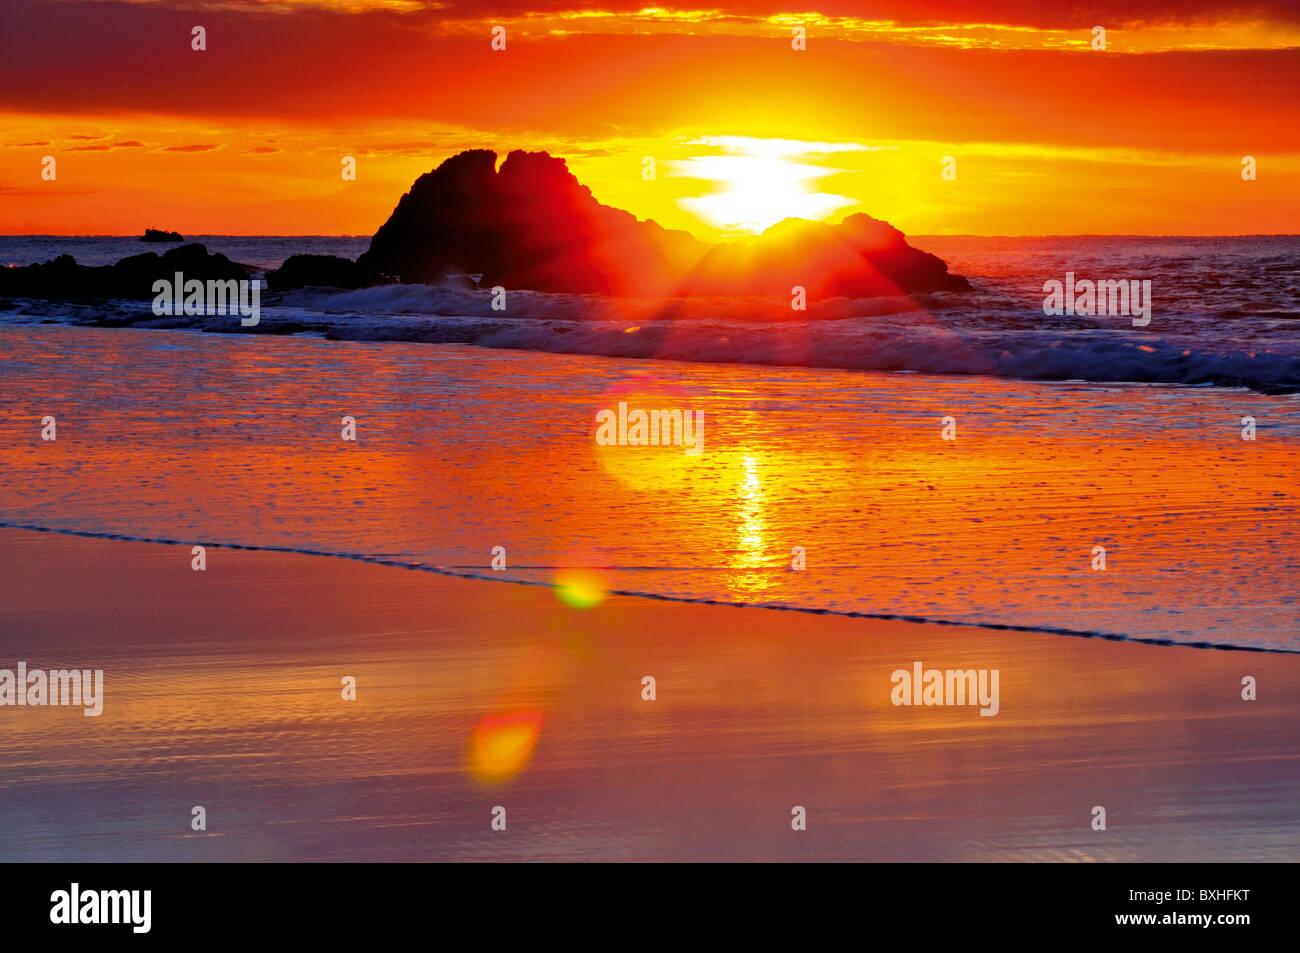 Portugal, Algarve: Sundown at a beach of nature park Costa Vicentina - Stock Image